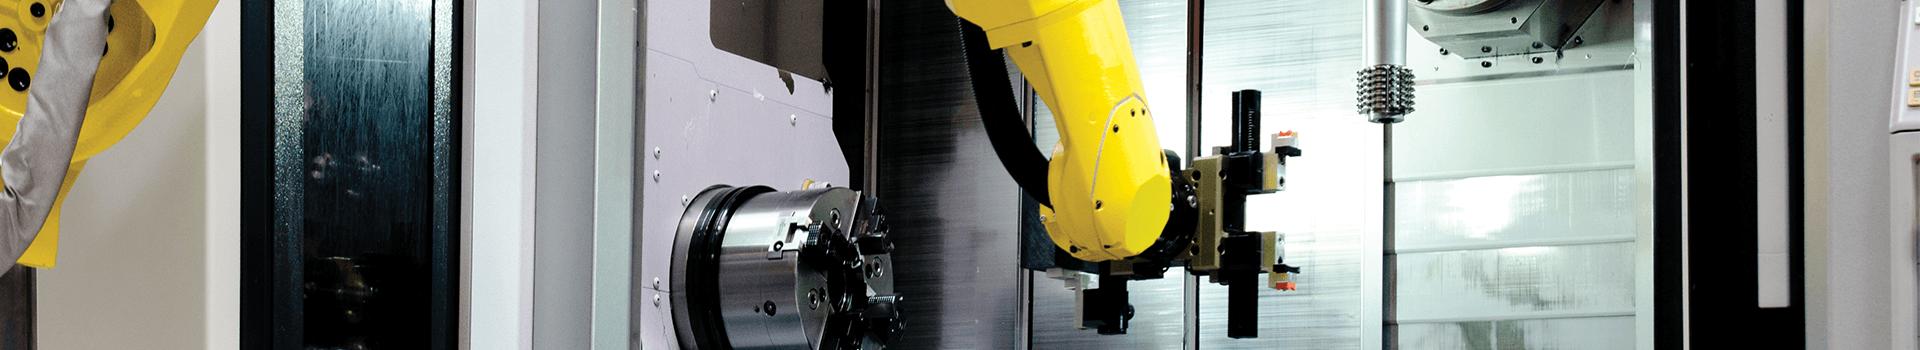 Robotautomatisering bij Cellro